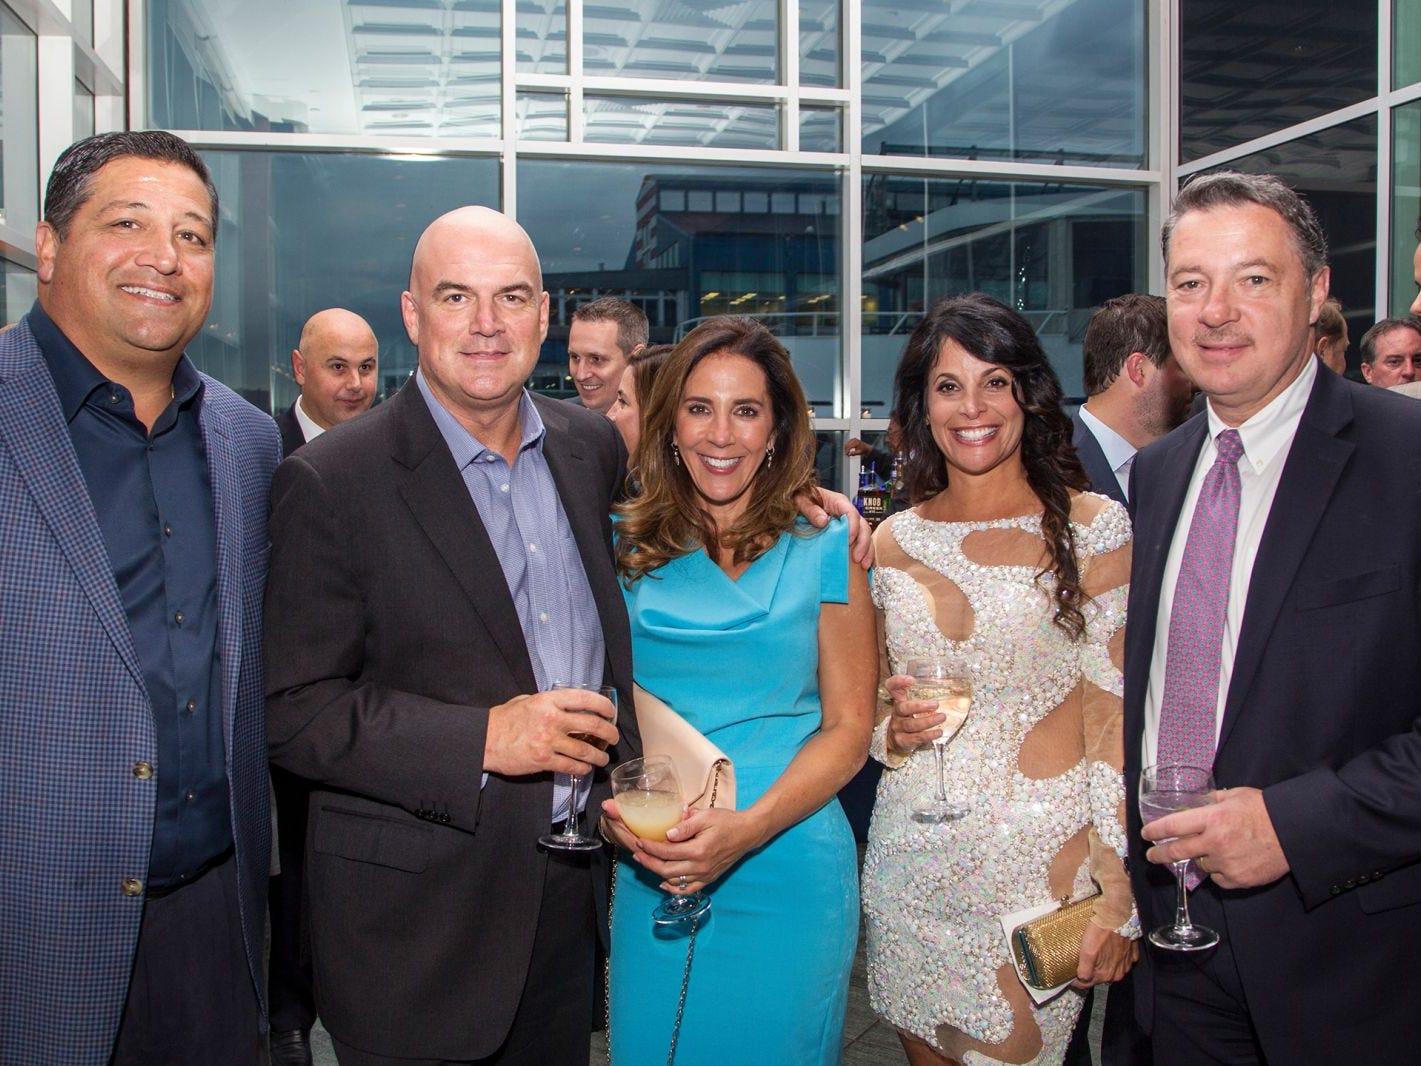 Paul Vegliante, James and Gina Anello, Maryann and John Scheibelhoffer. 11th annual IronMatt Fundraiser Gala at Pier 60 Chelsea Piers. 09/20/2018